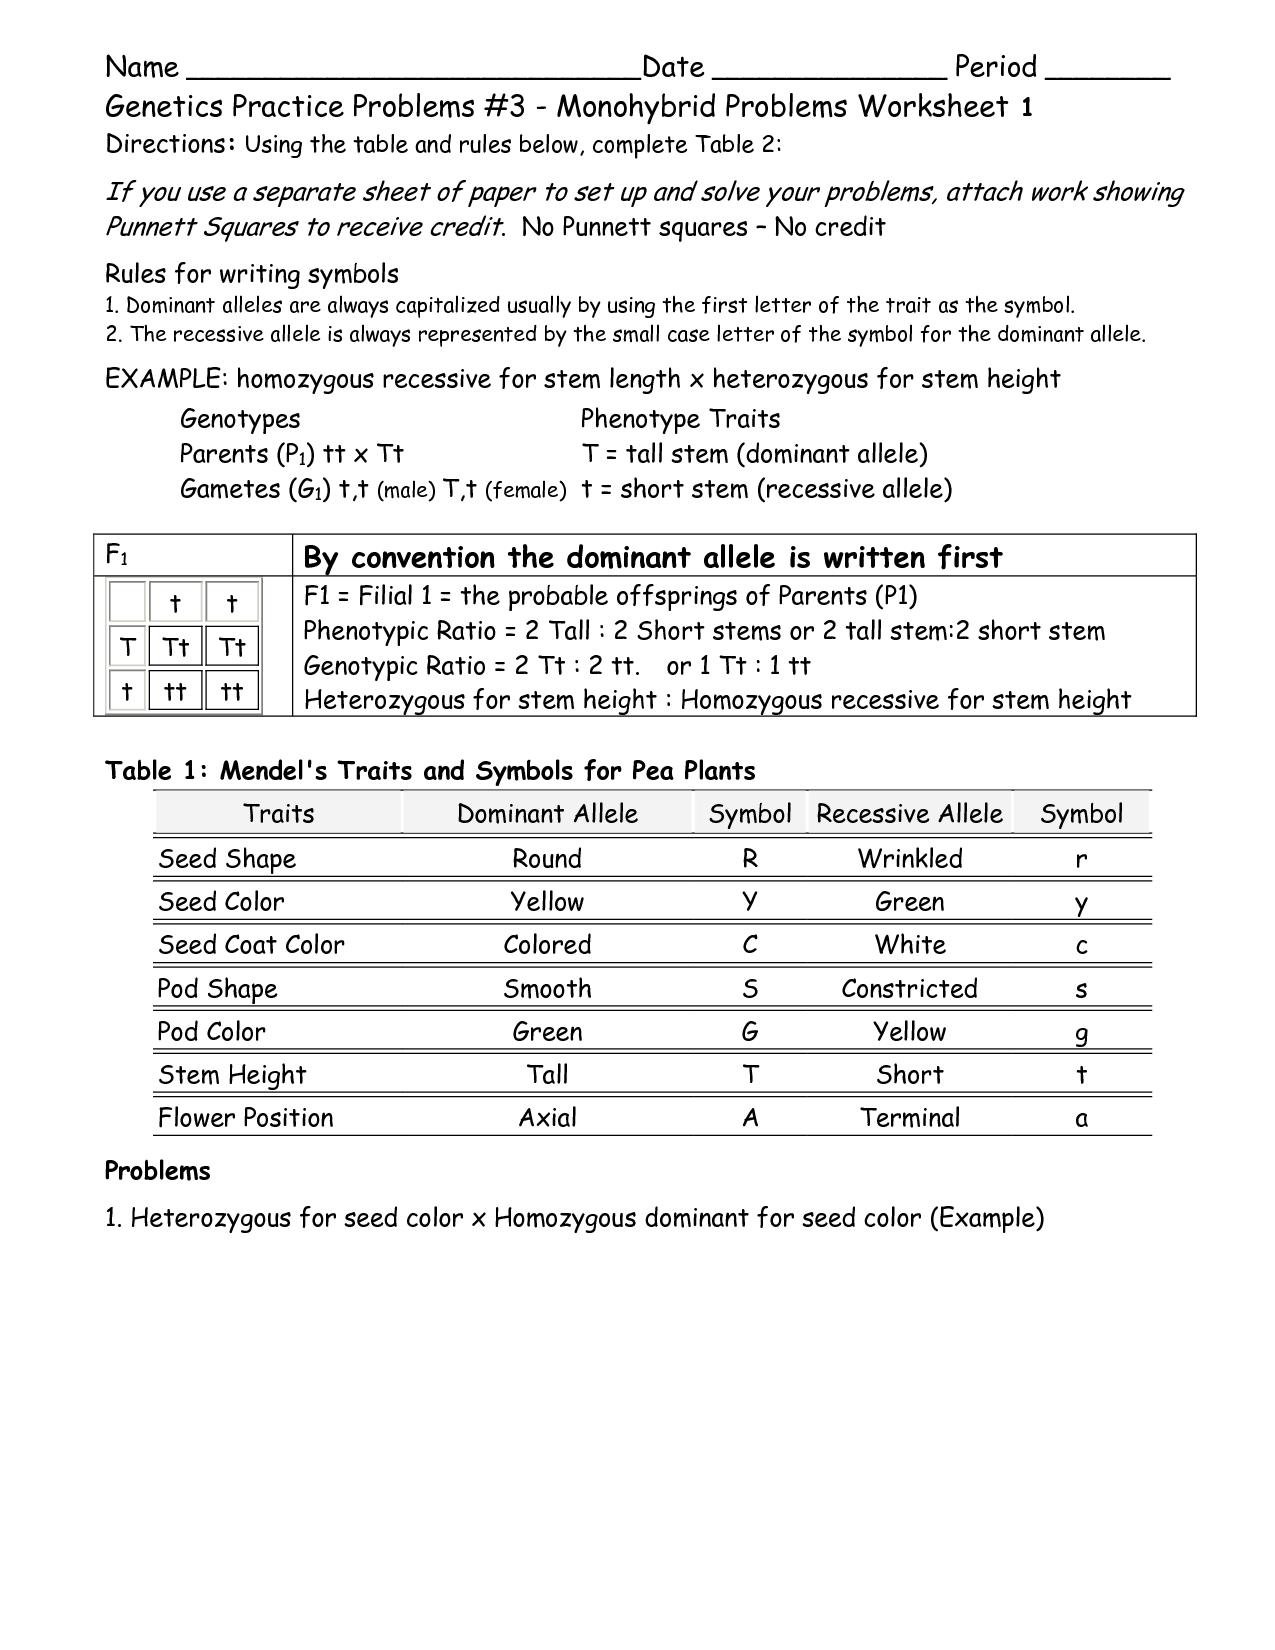 Mendel Genetics Worksheet